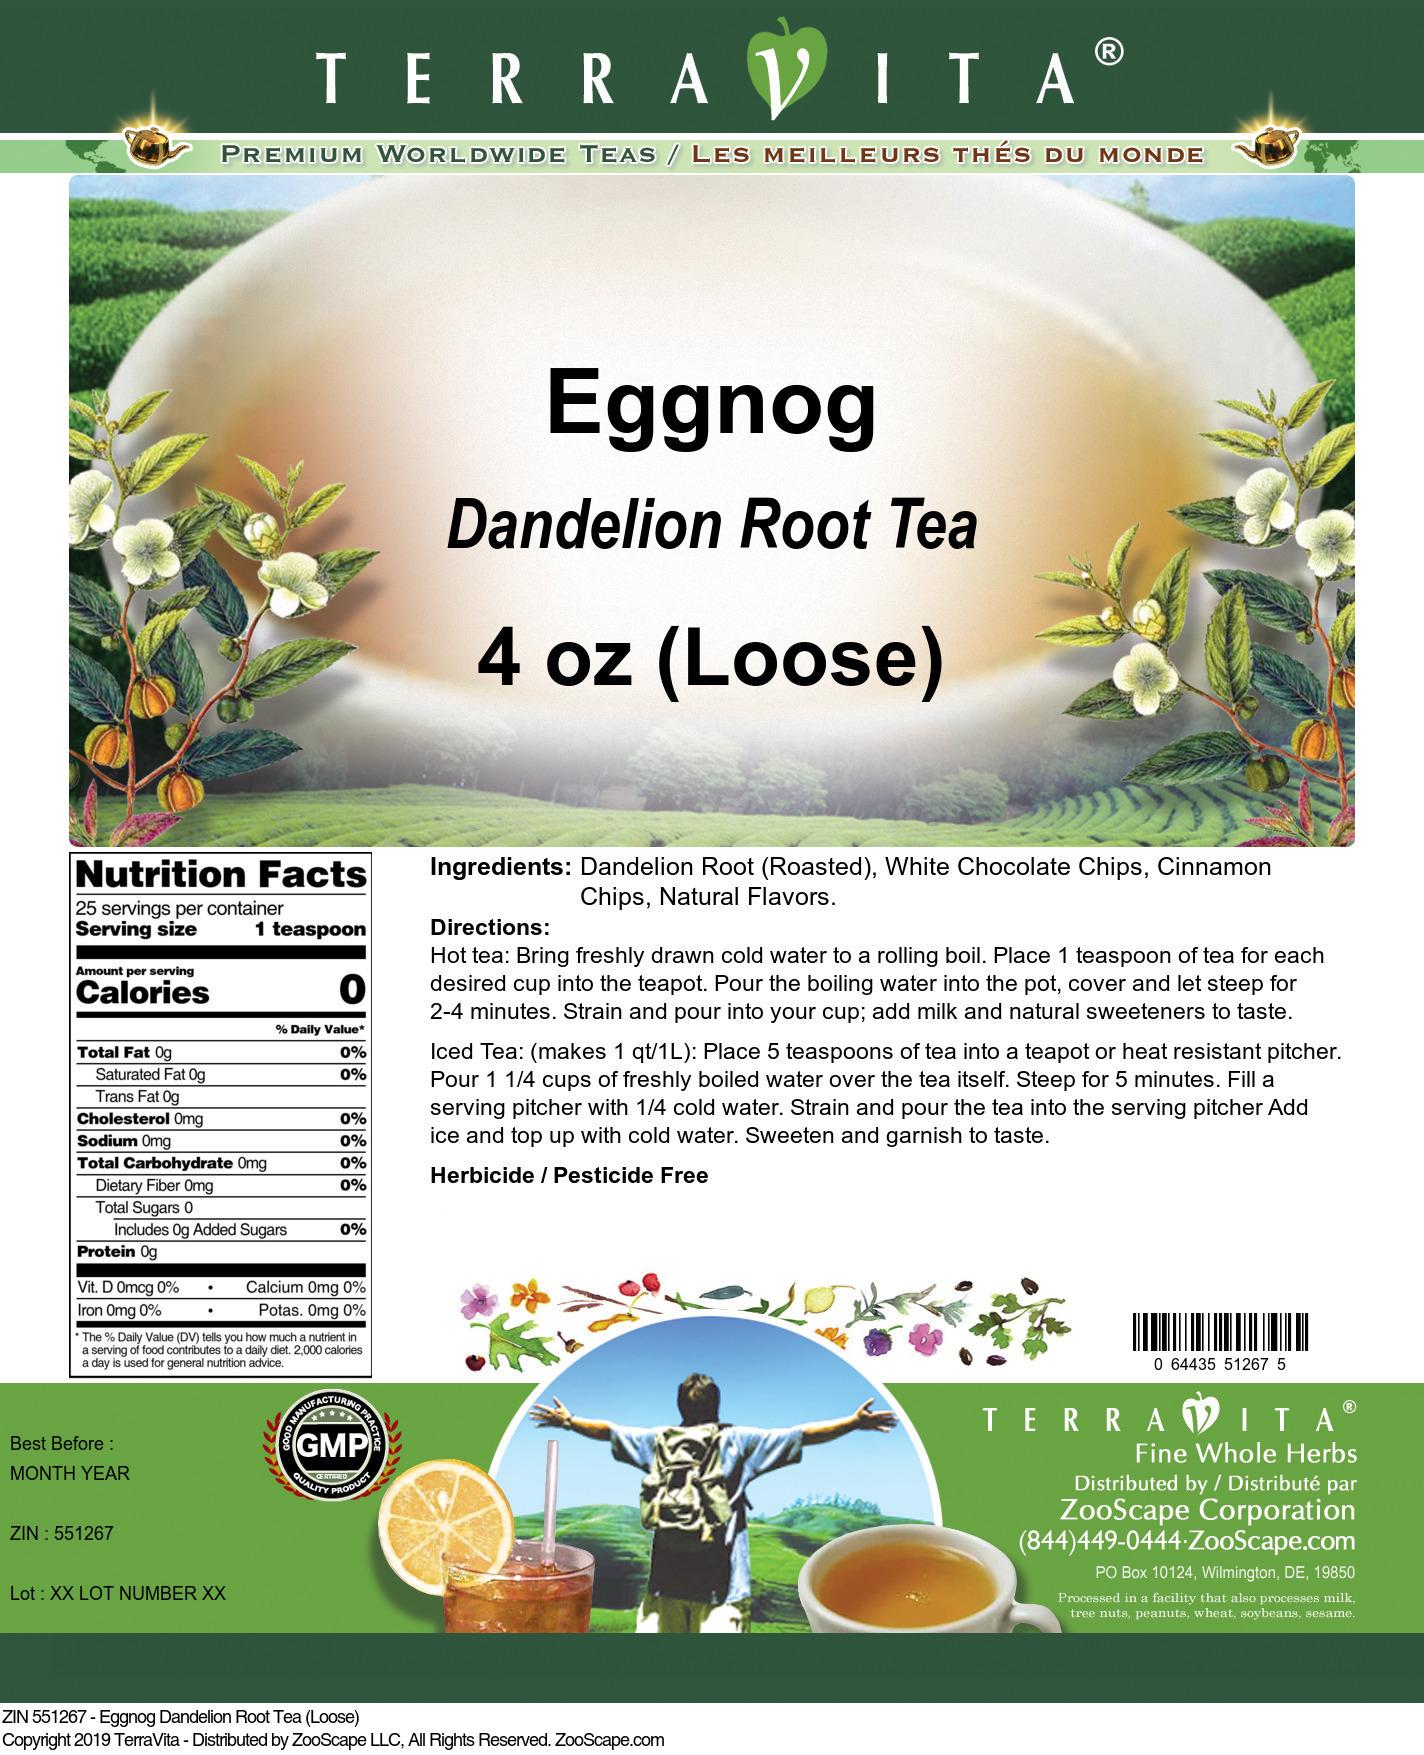 Eggnog Dandelion Root